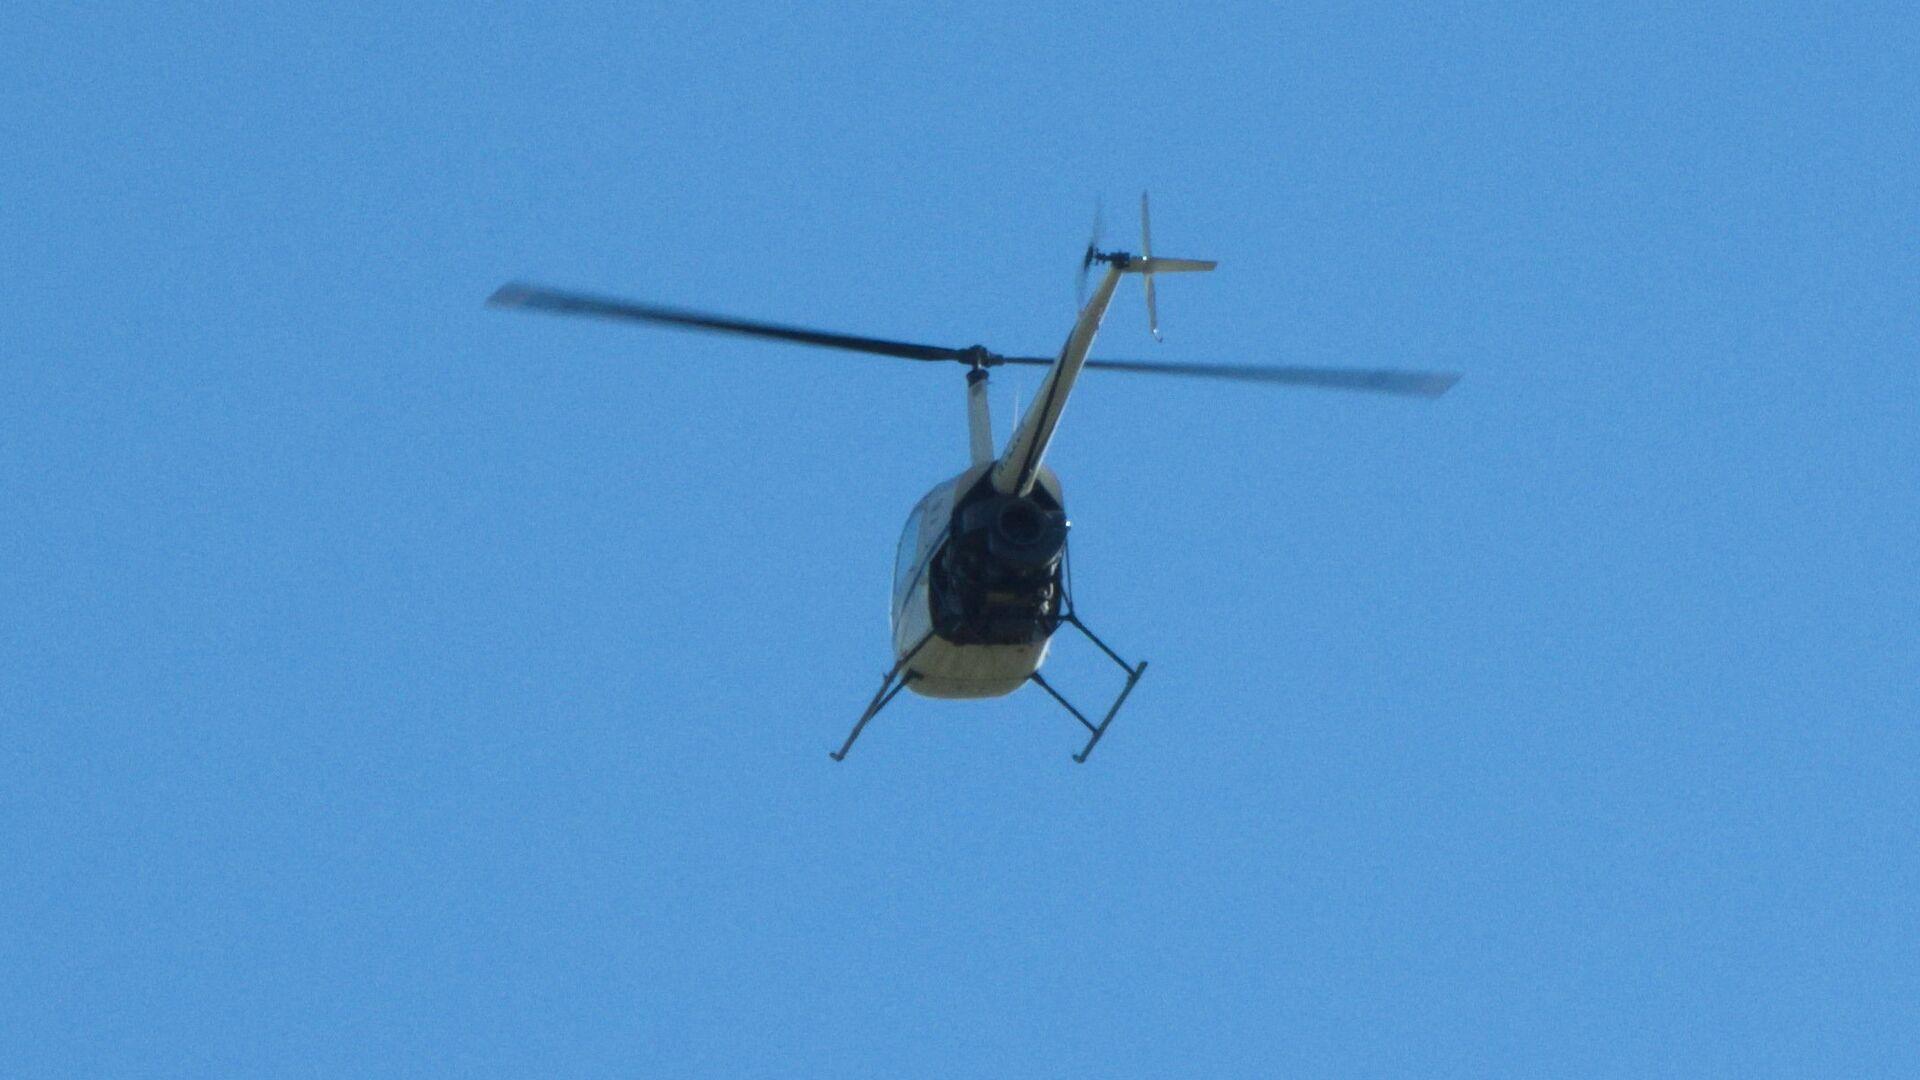 Helicóptero Robinson - Sputnik Mundo, 1920, 03.10.2021